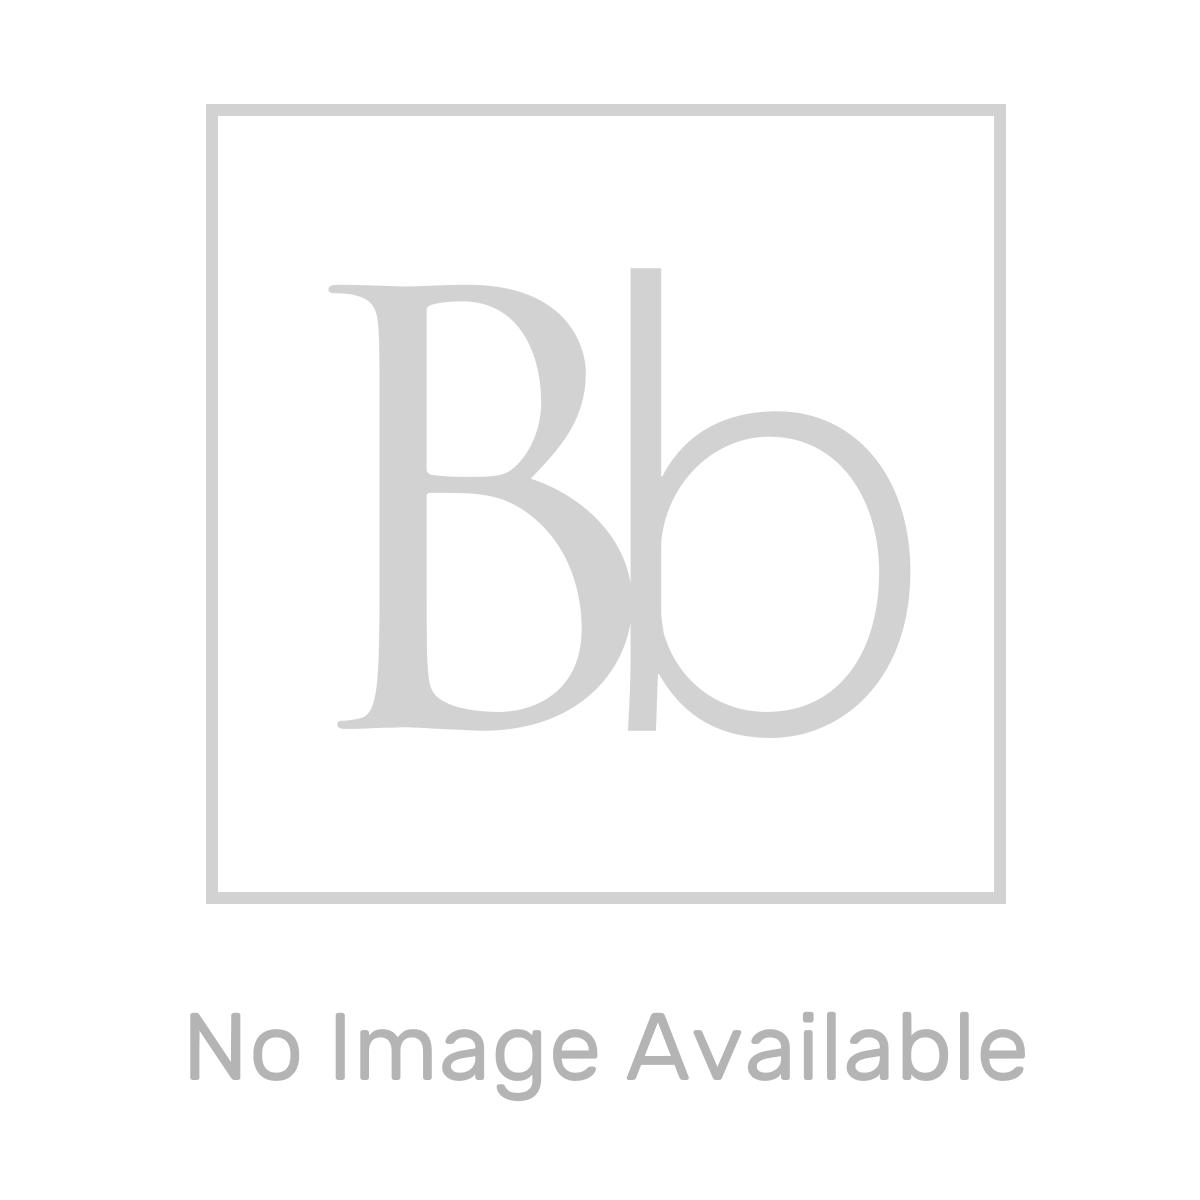 Premier High Gloss White Bathroom Mirror and Light 550mm